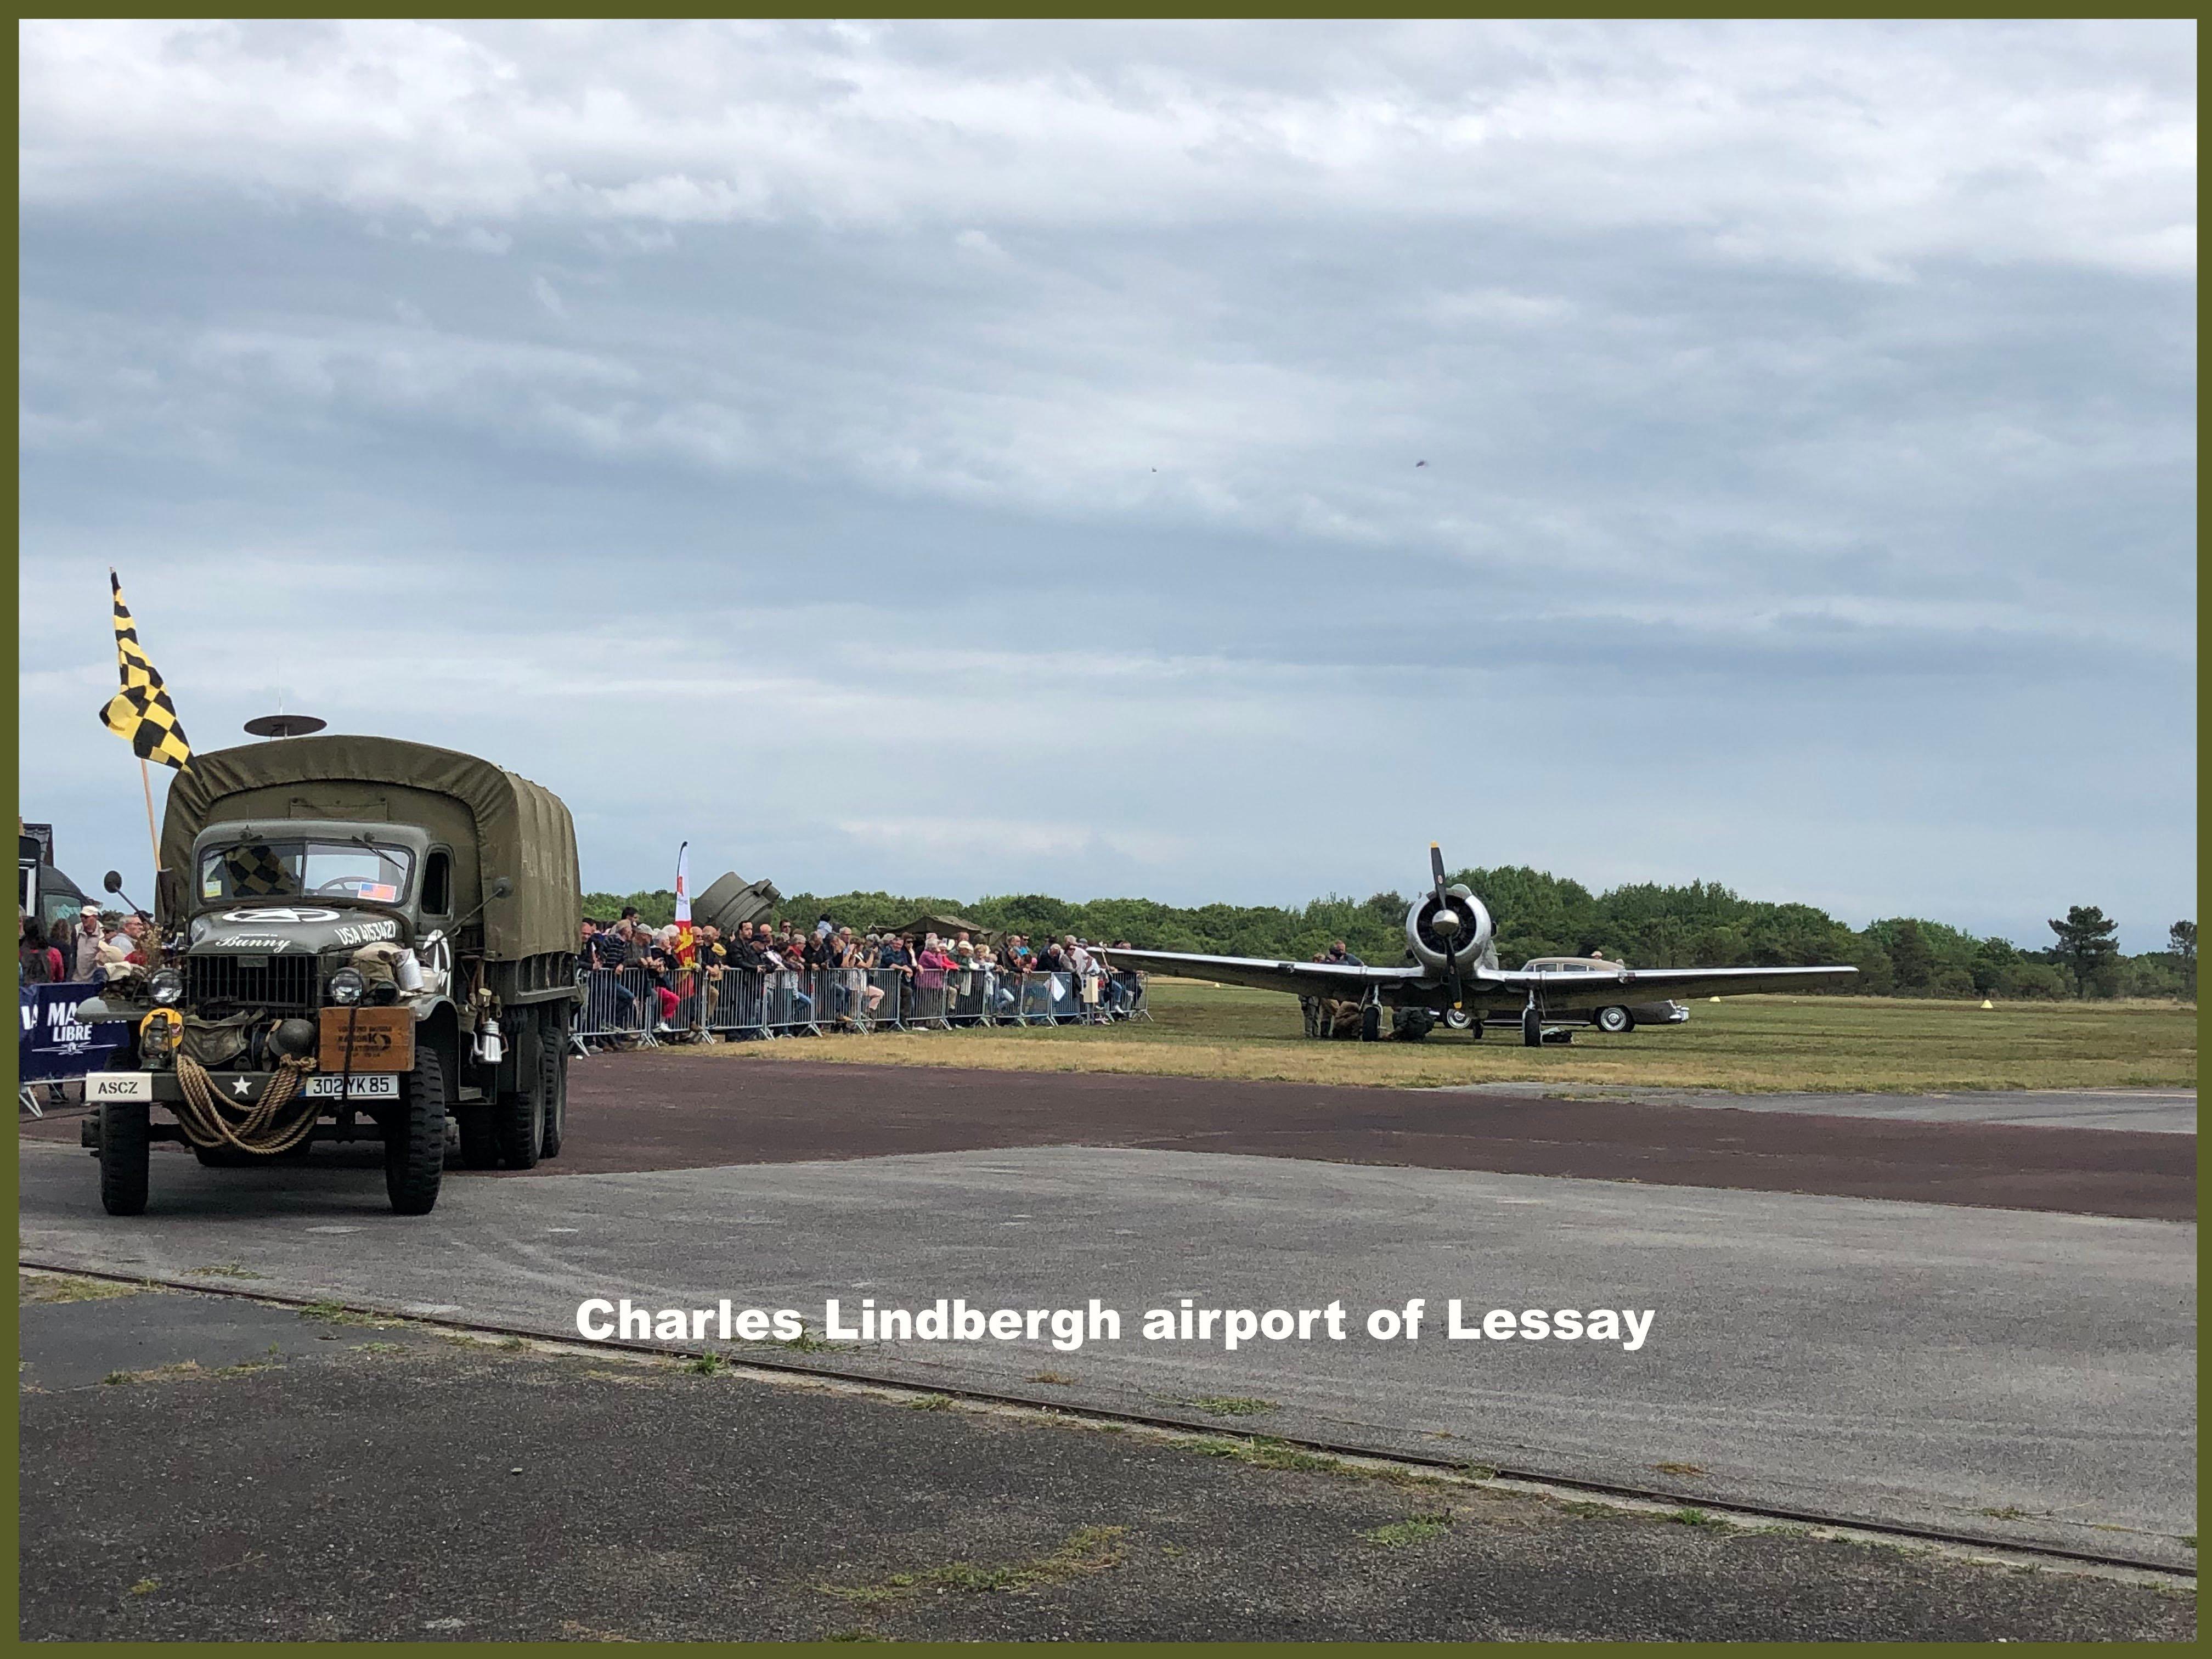 Lessay charles Lindberg airport copy